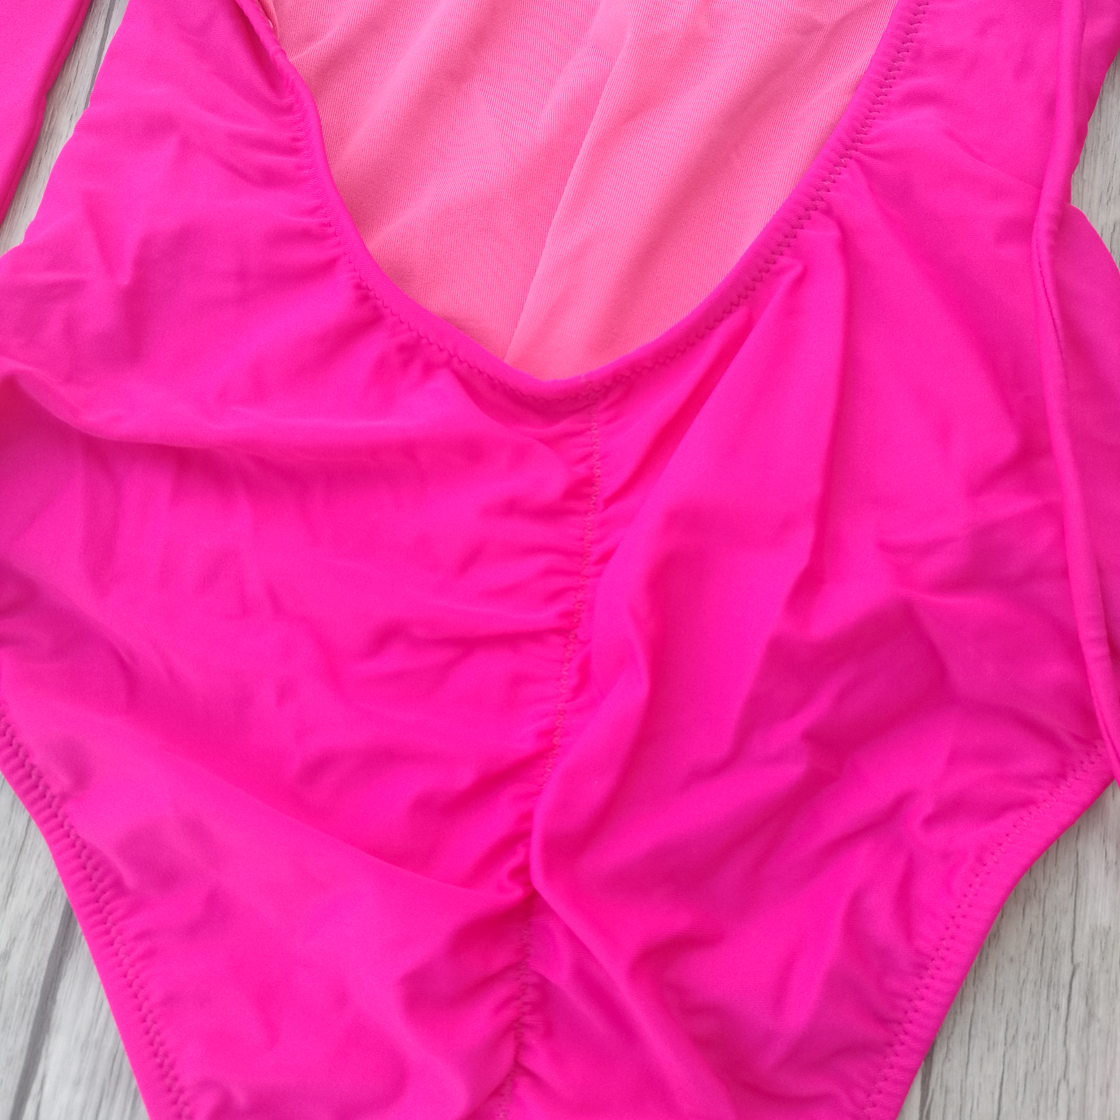 Women One-pieces Swimsuit Pink Vintage Swimwear Underwier woman push up Sexy Secret Mini micro brazilian 1 pieces Tankinis